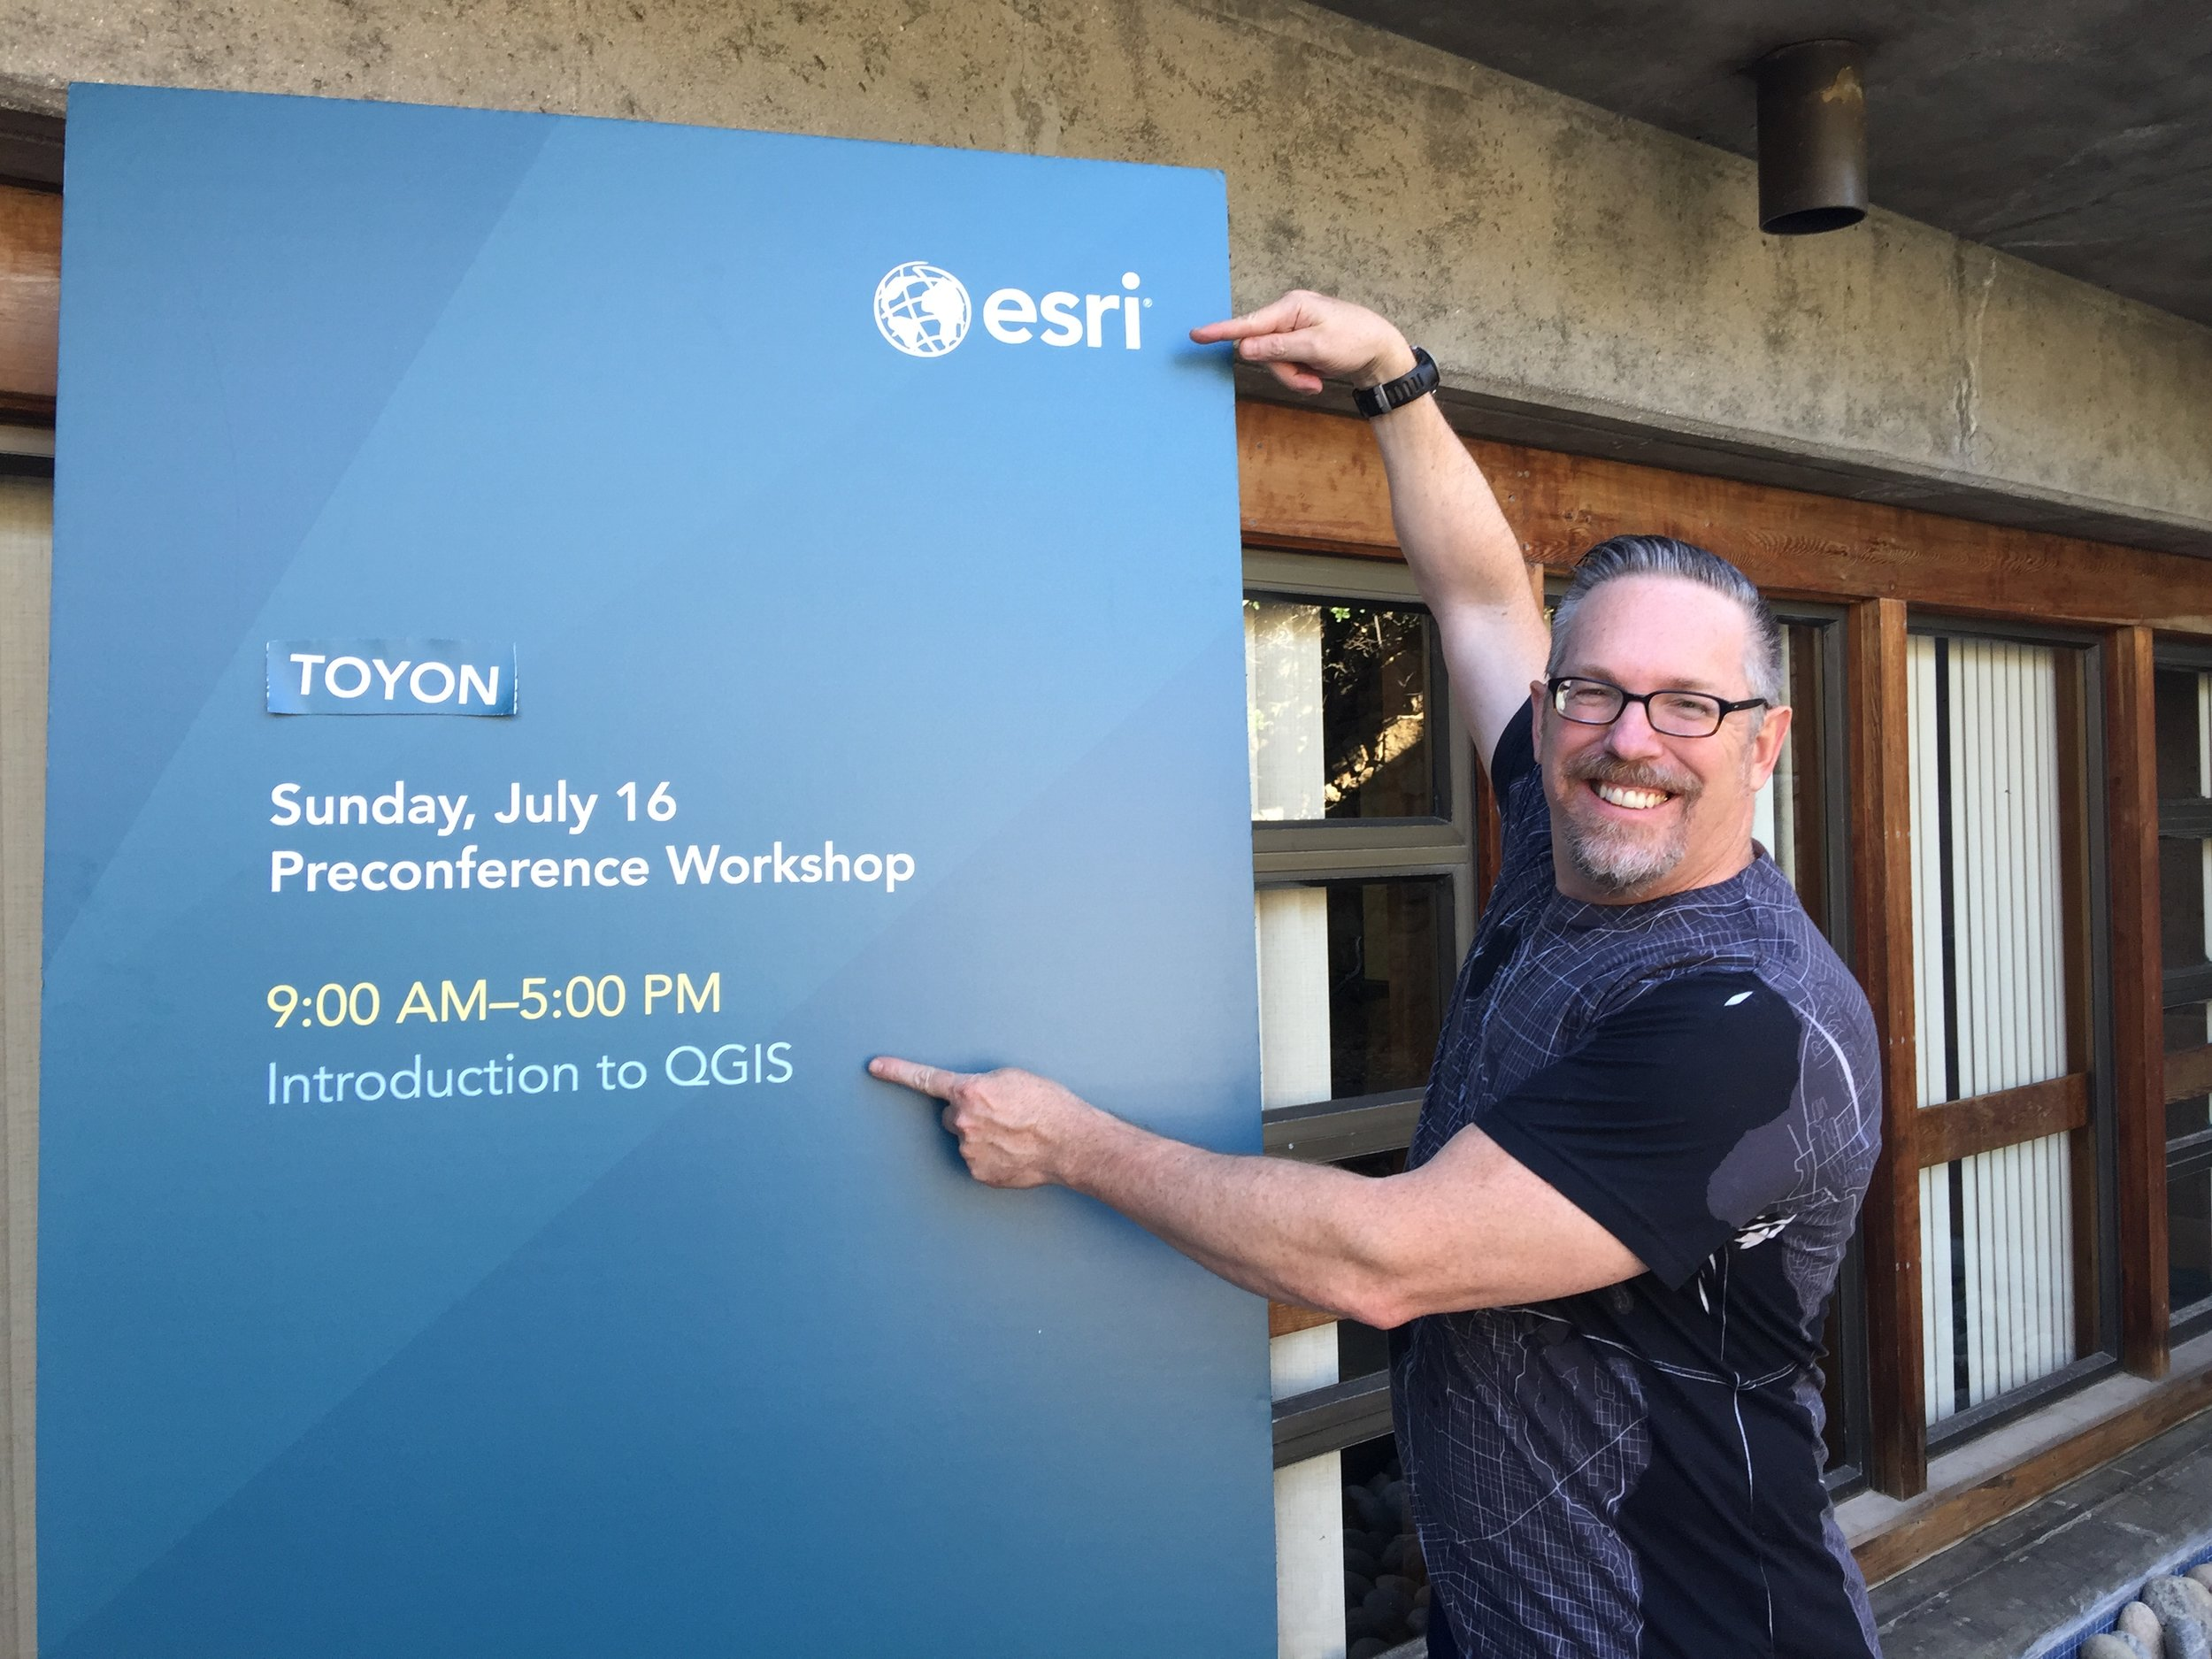 A QGIS workshop at an Esri sponsored conference?!